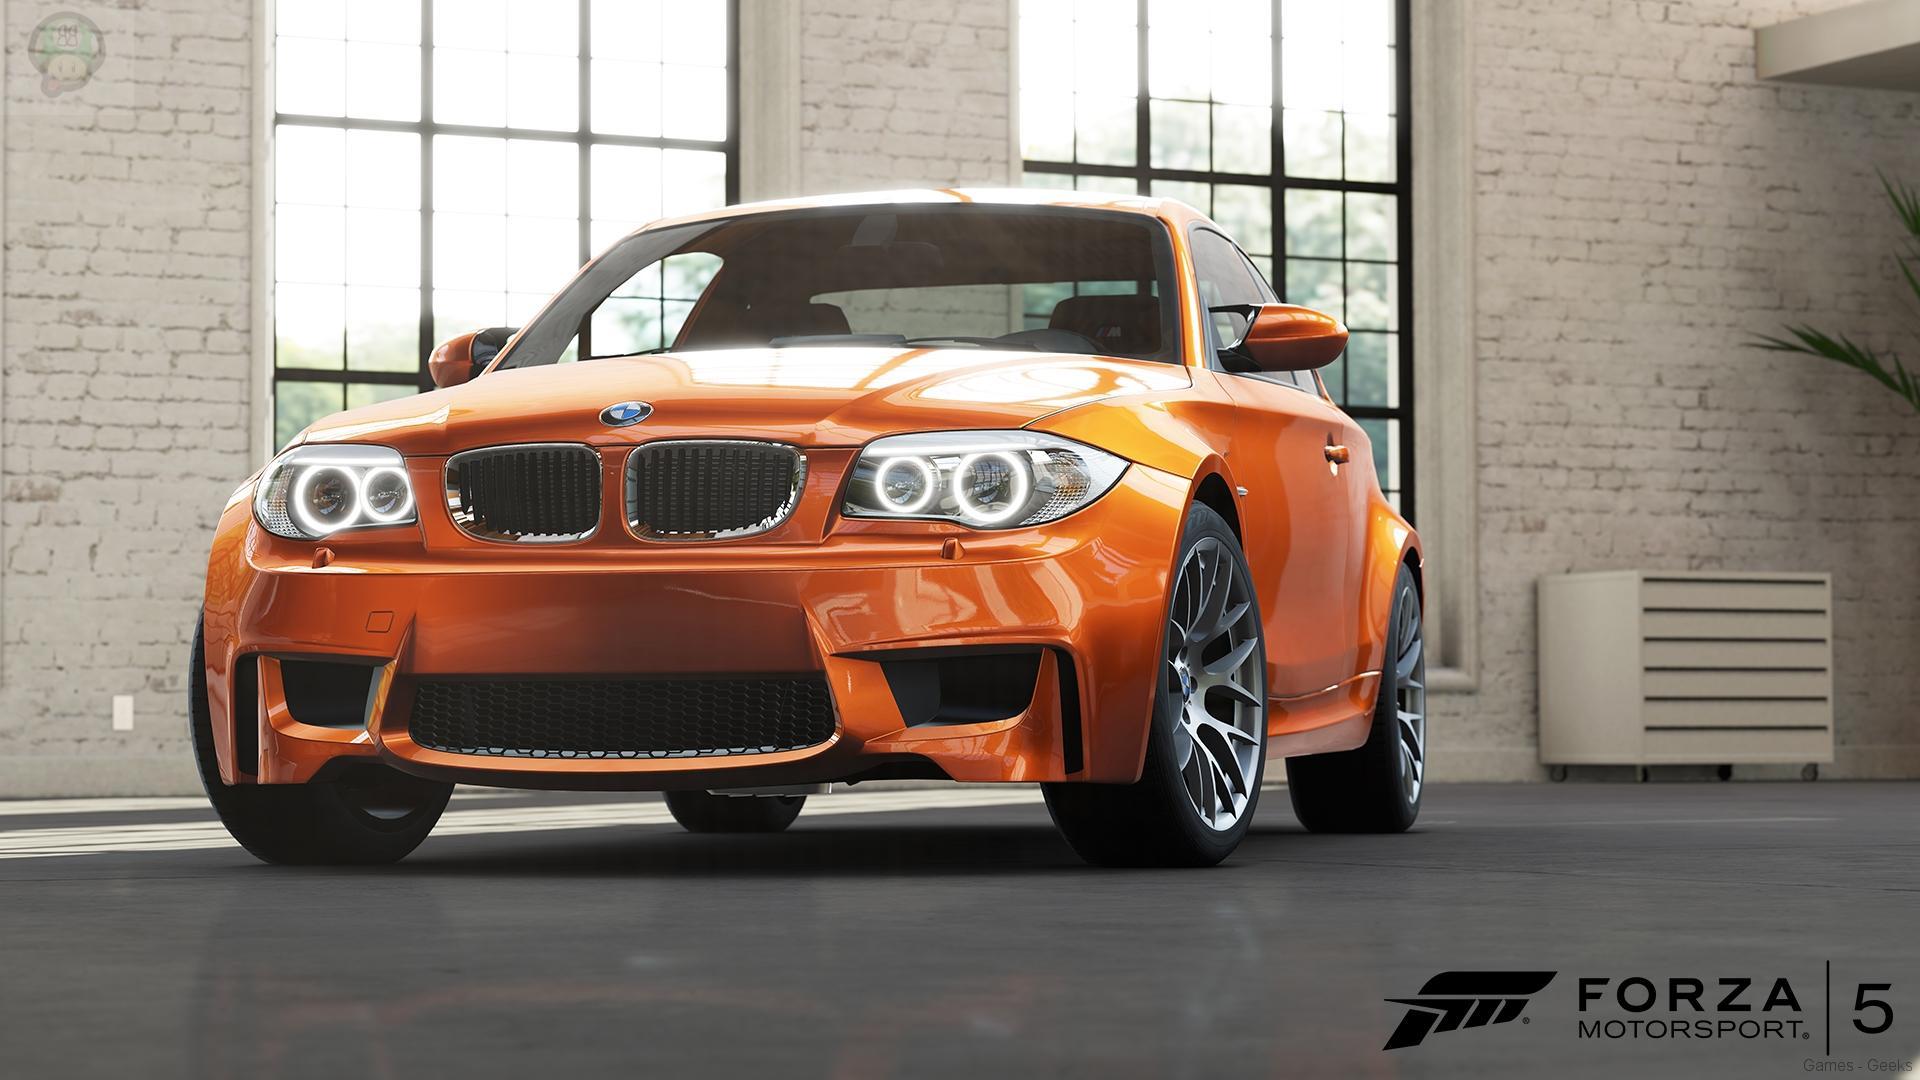 forza5-carreveal-bmw-1seriesmcoupe-wm-wjnlcb Forza 5 : 4 nouvelles voitures dévoilées